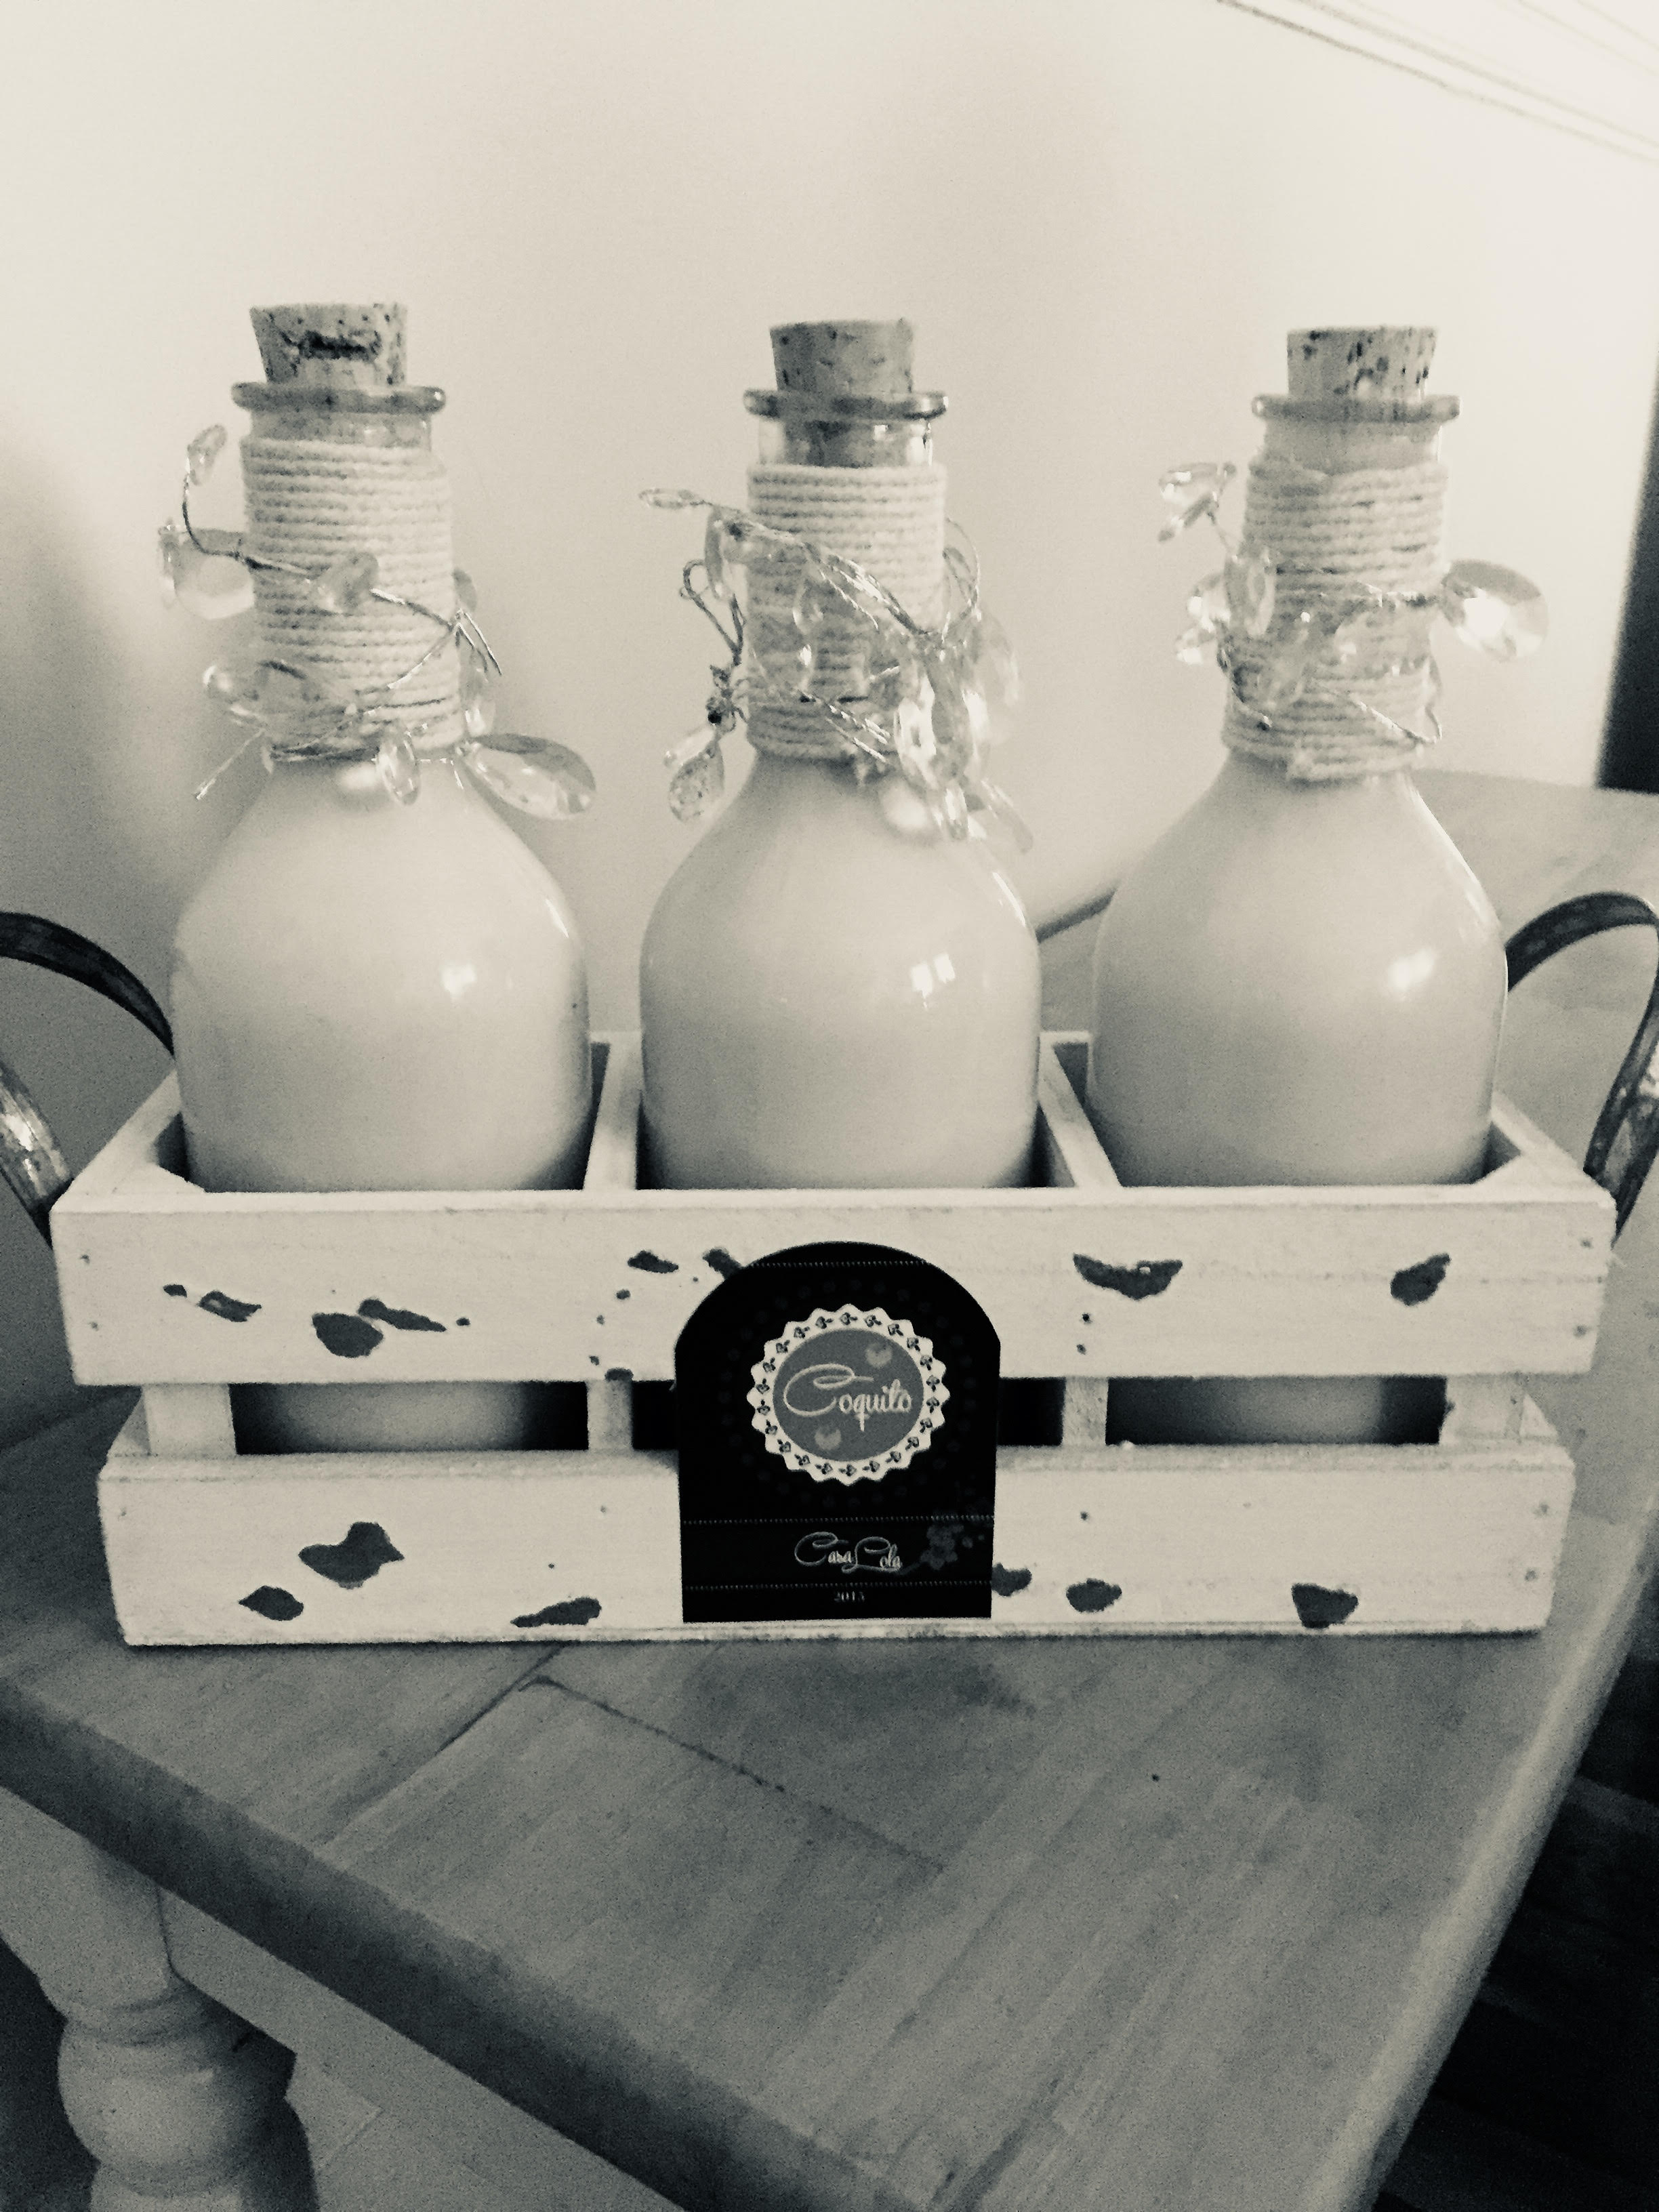 Coquinut 3 bottles.jpg